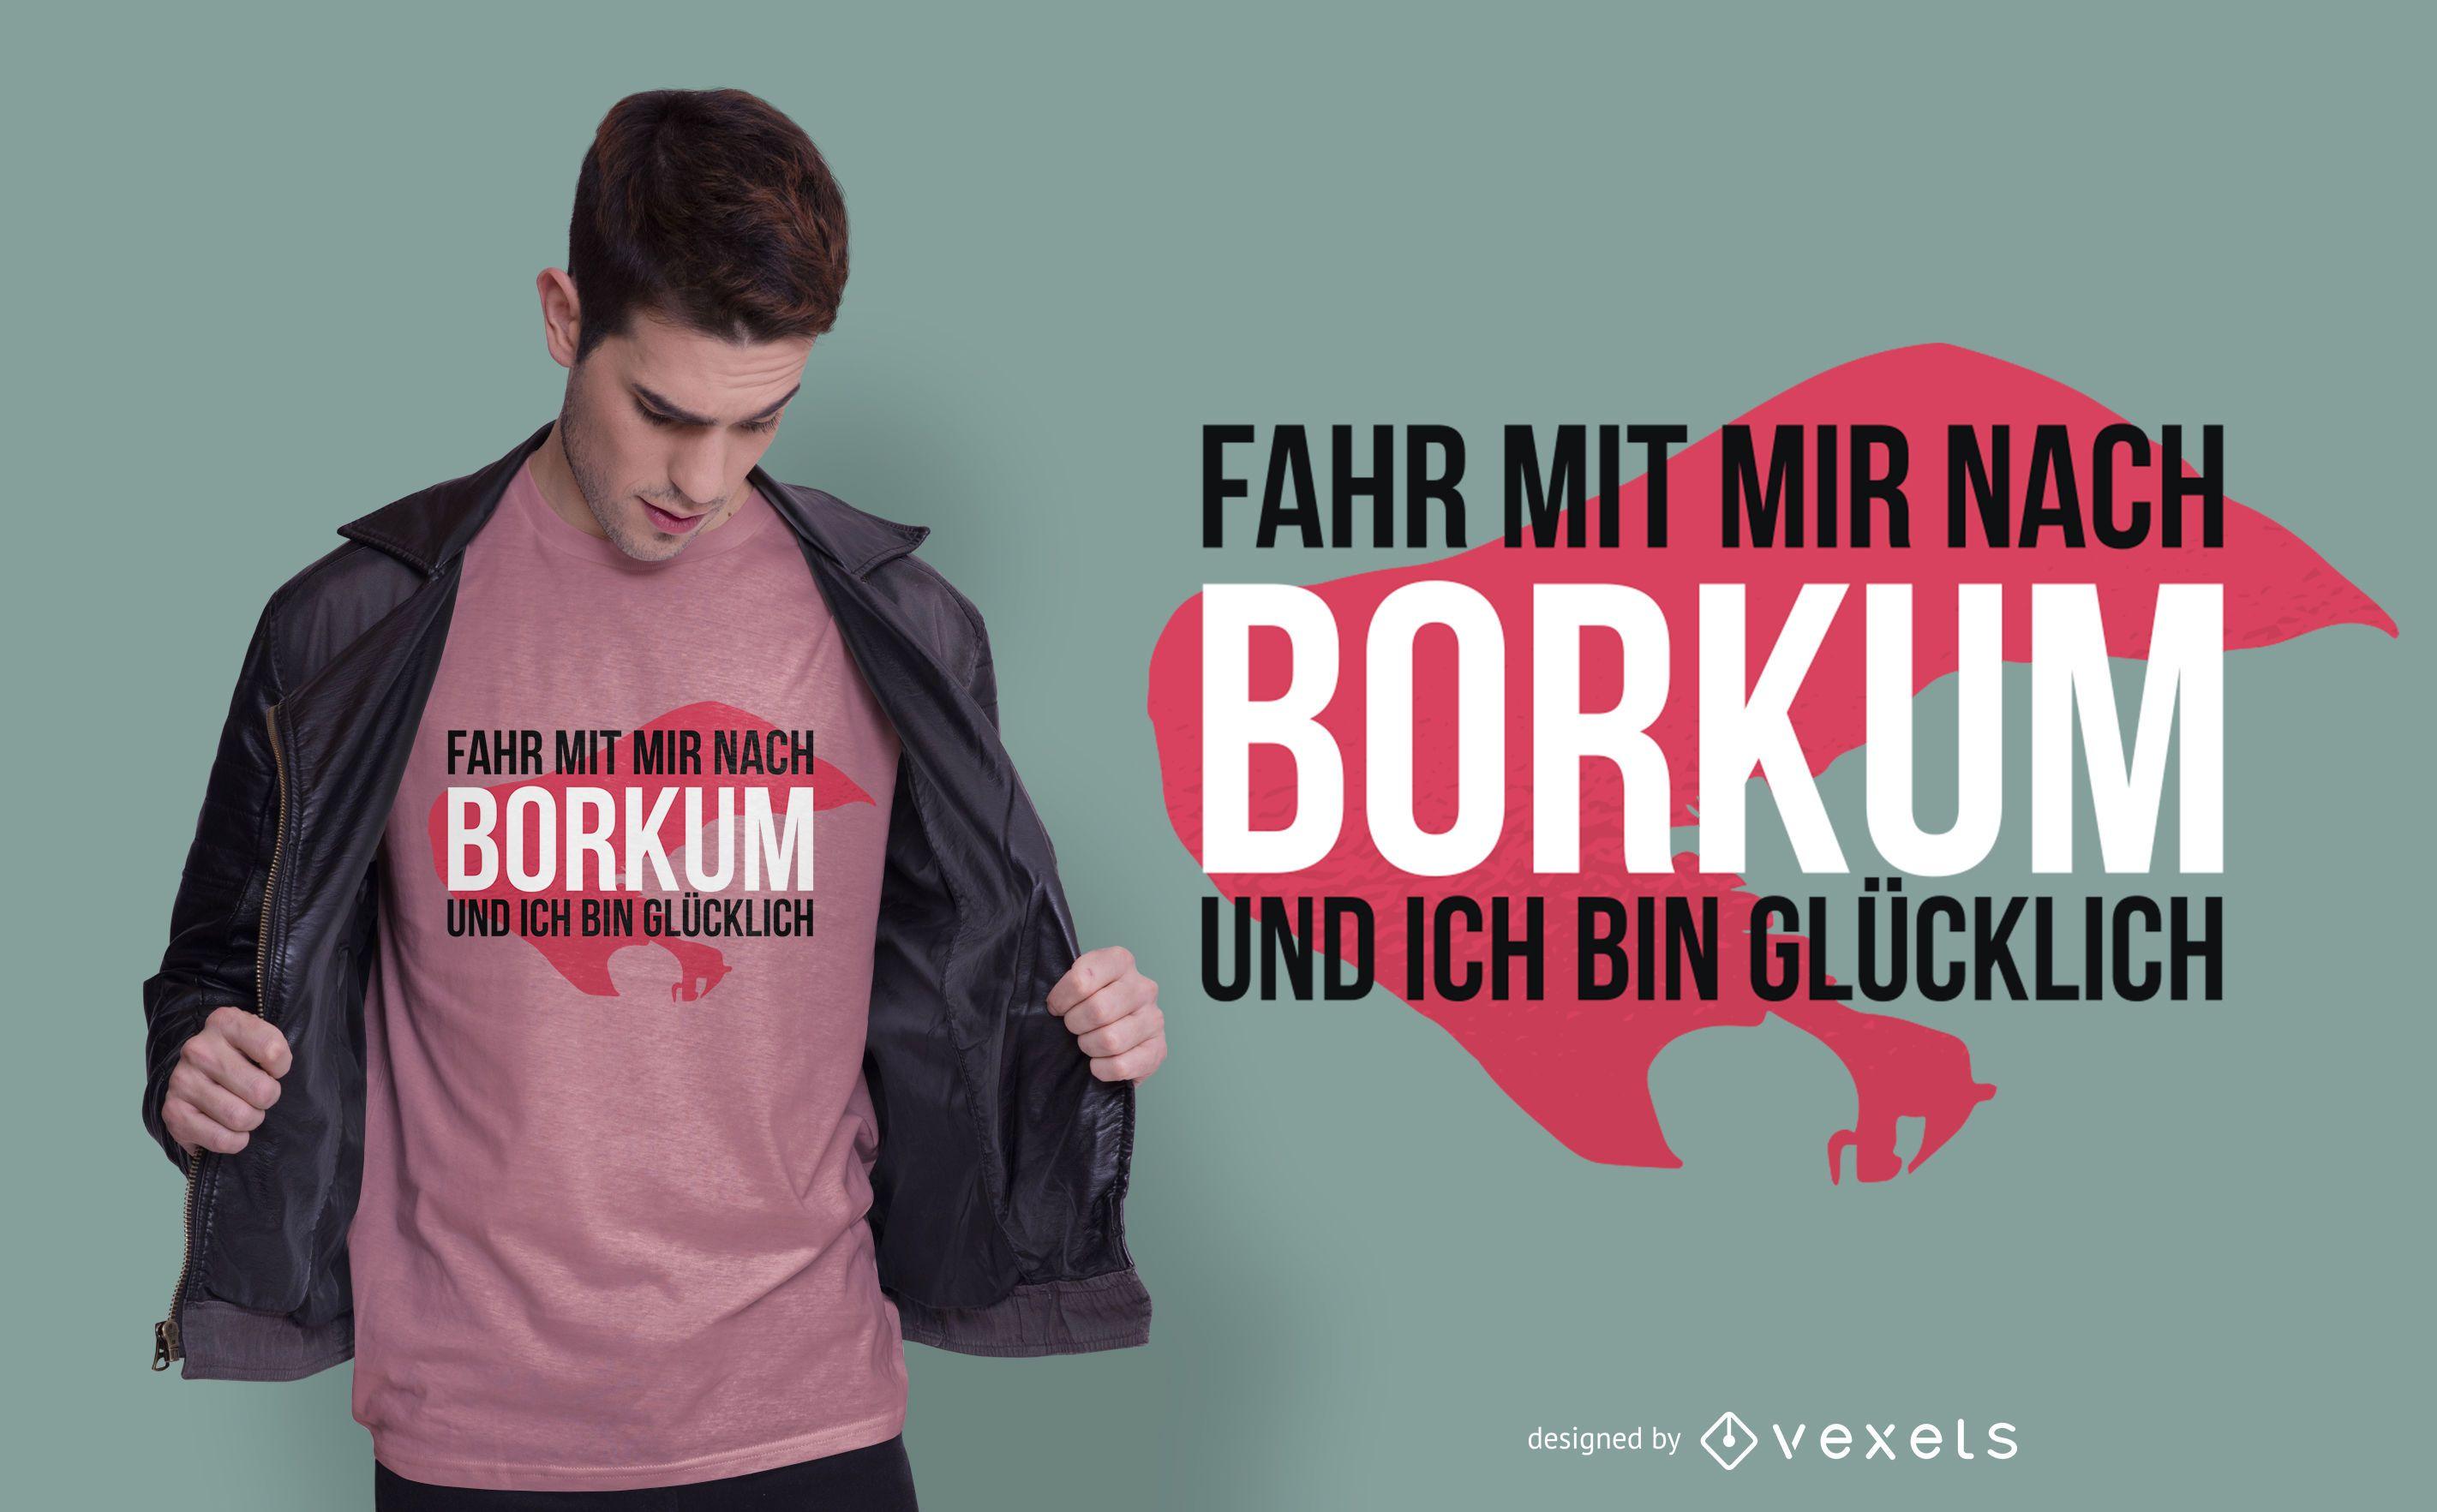 Borkum t-shirt design